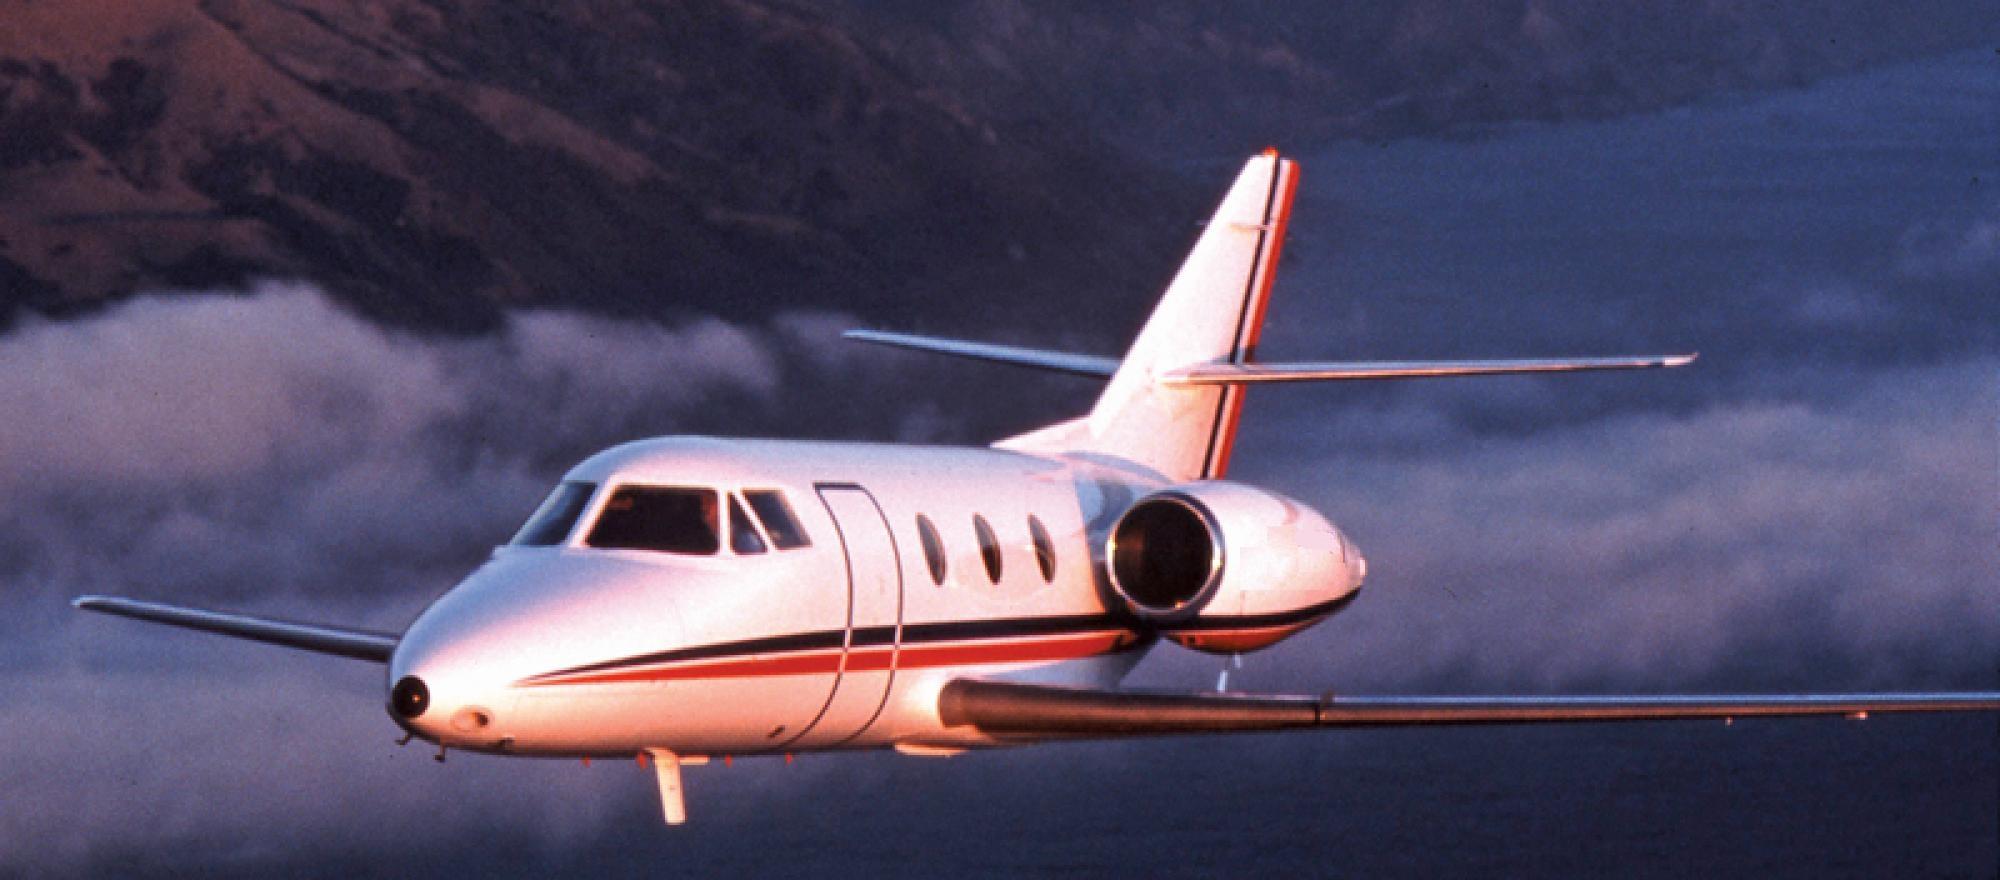 Dassault Falcon 10 jet charter services